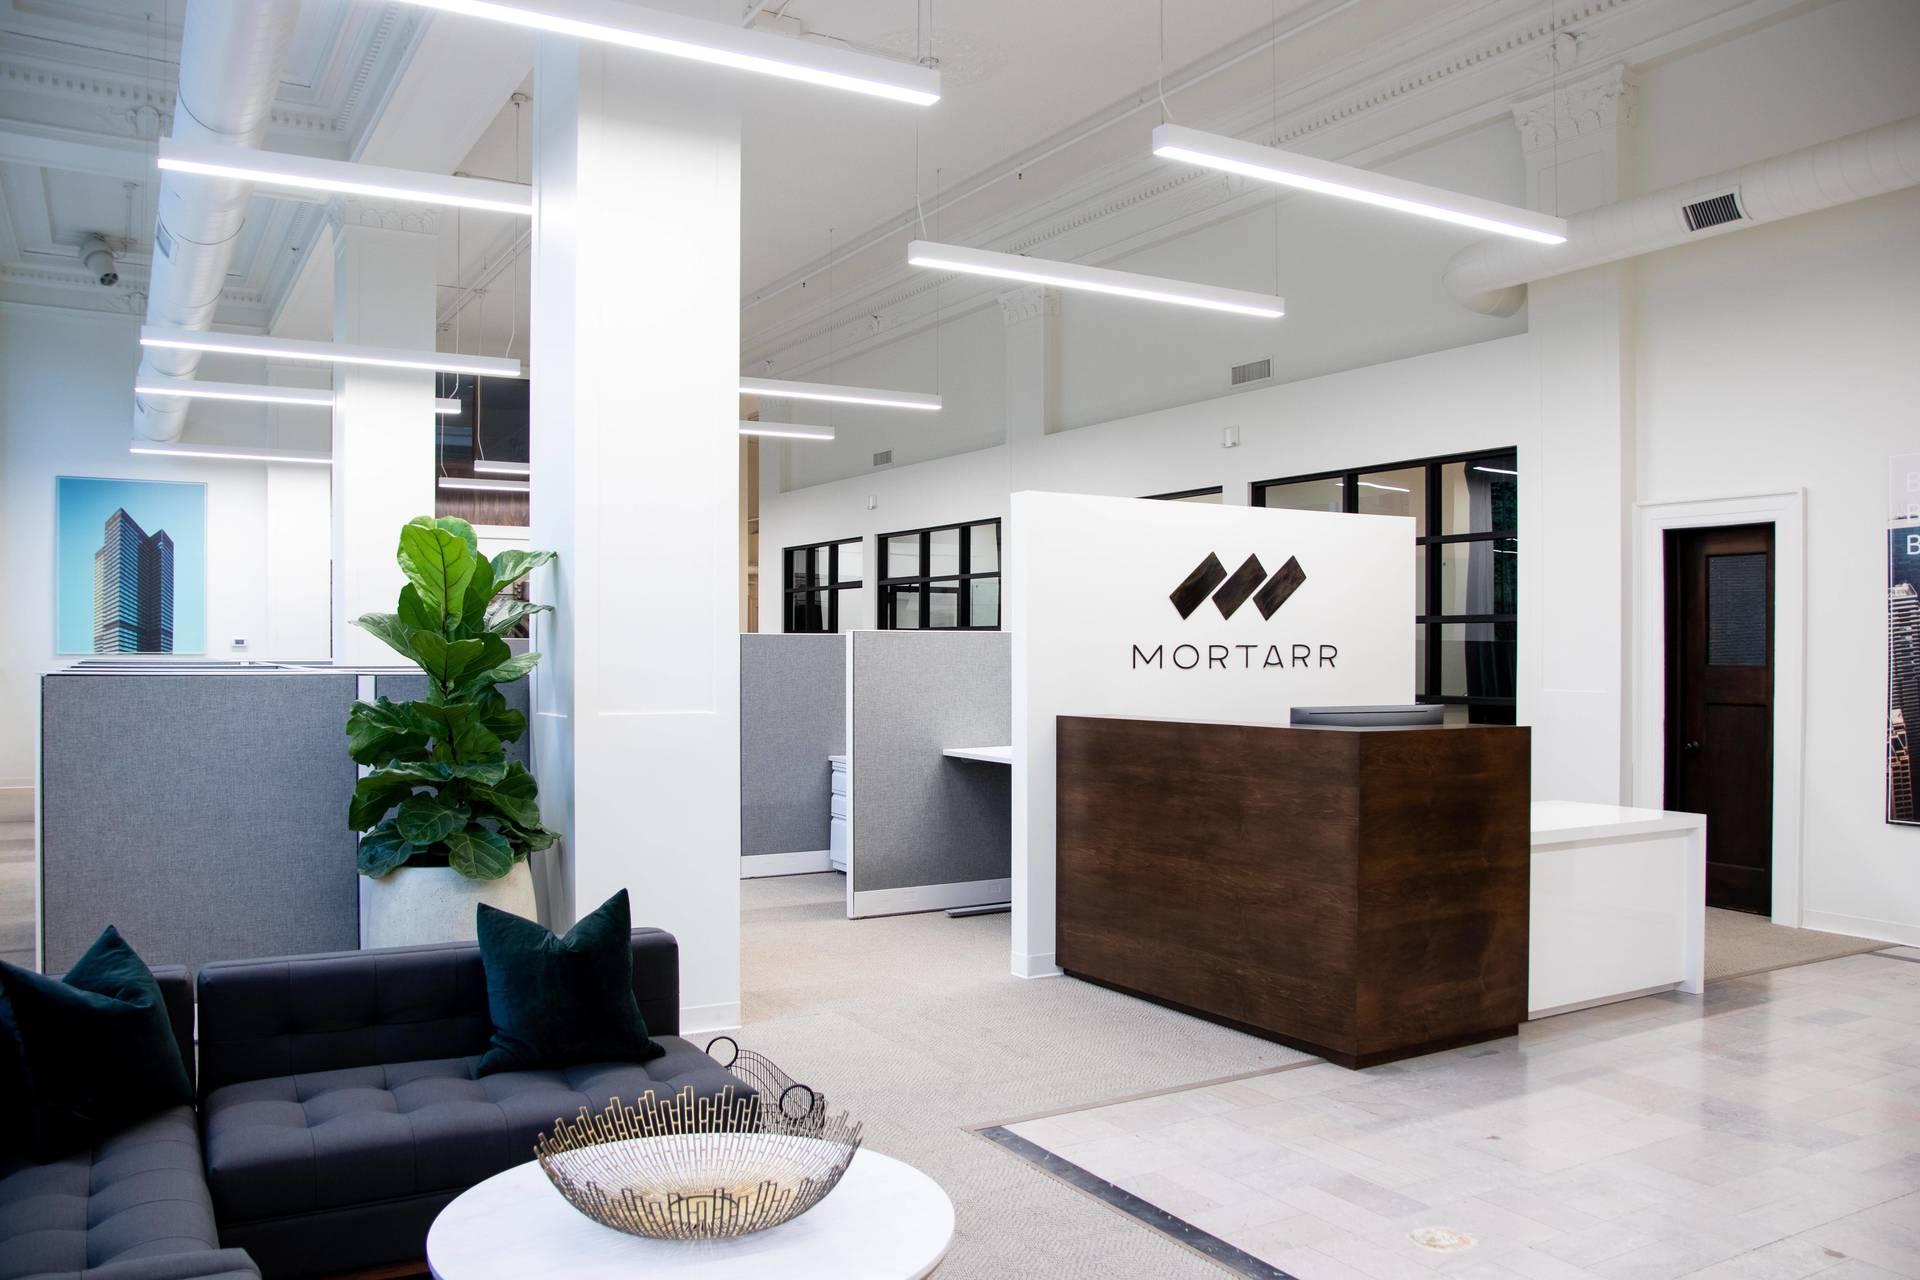 dras-cases-mortarr-headquarters-reception-desk-design-1920x1920